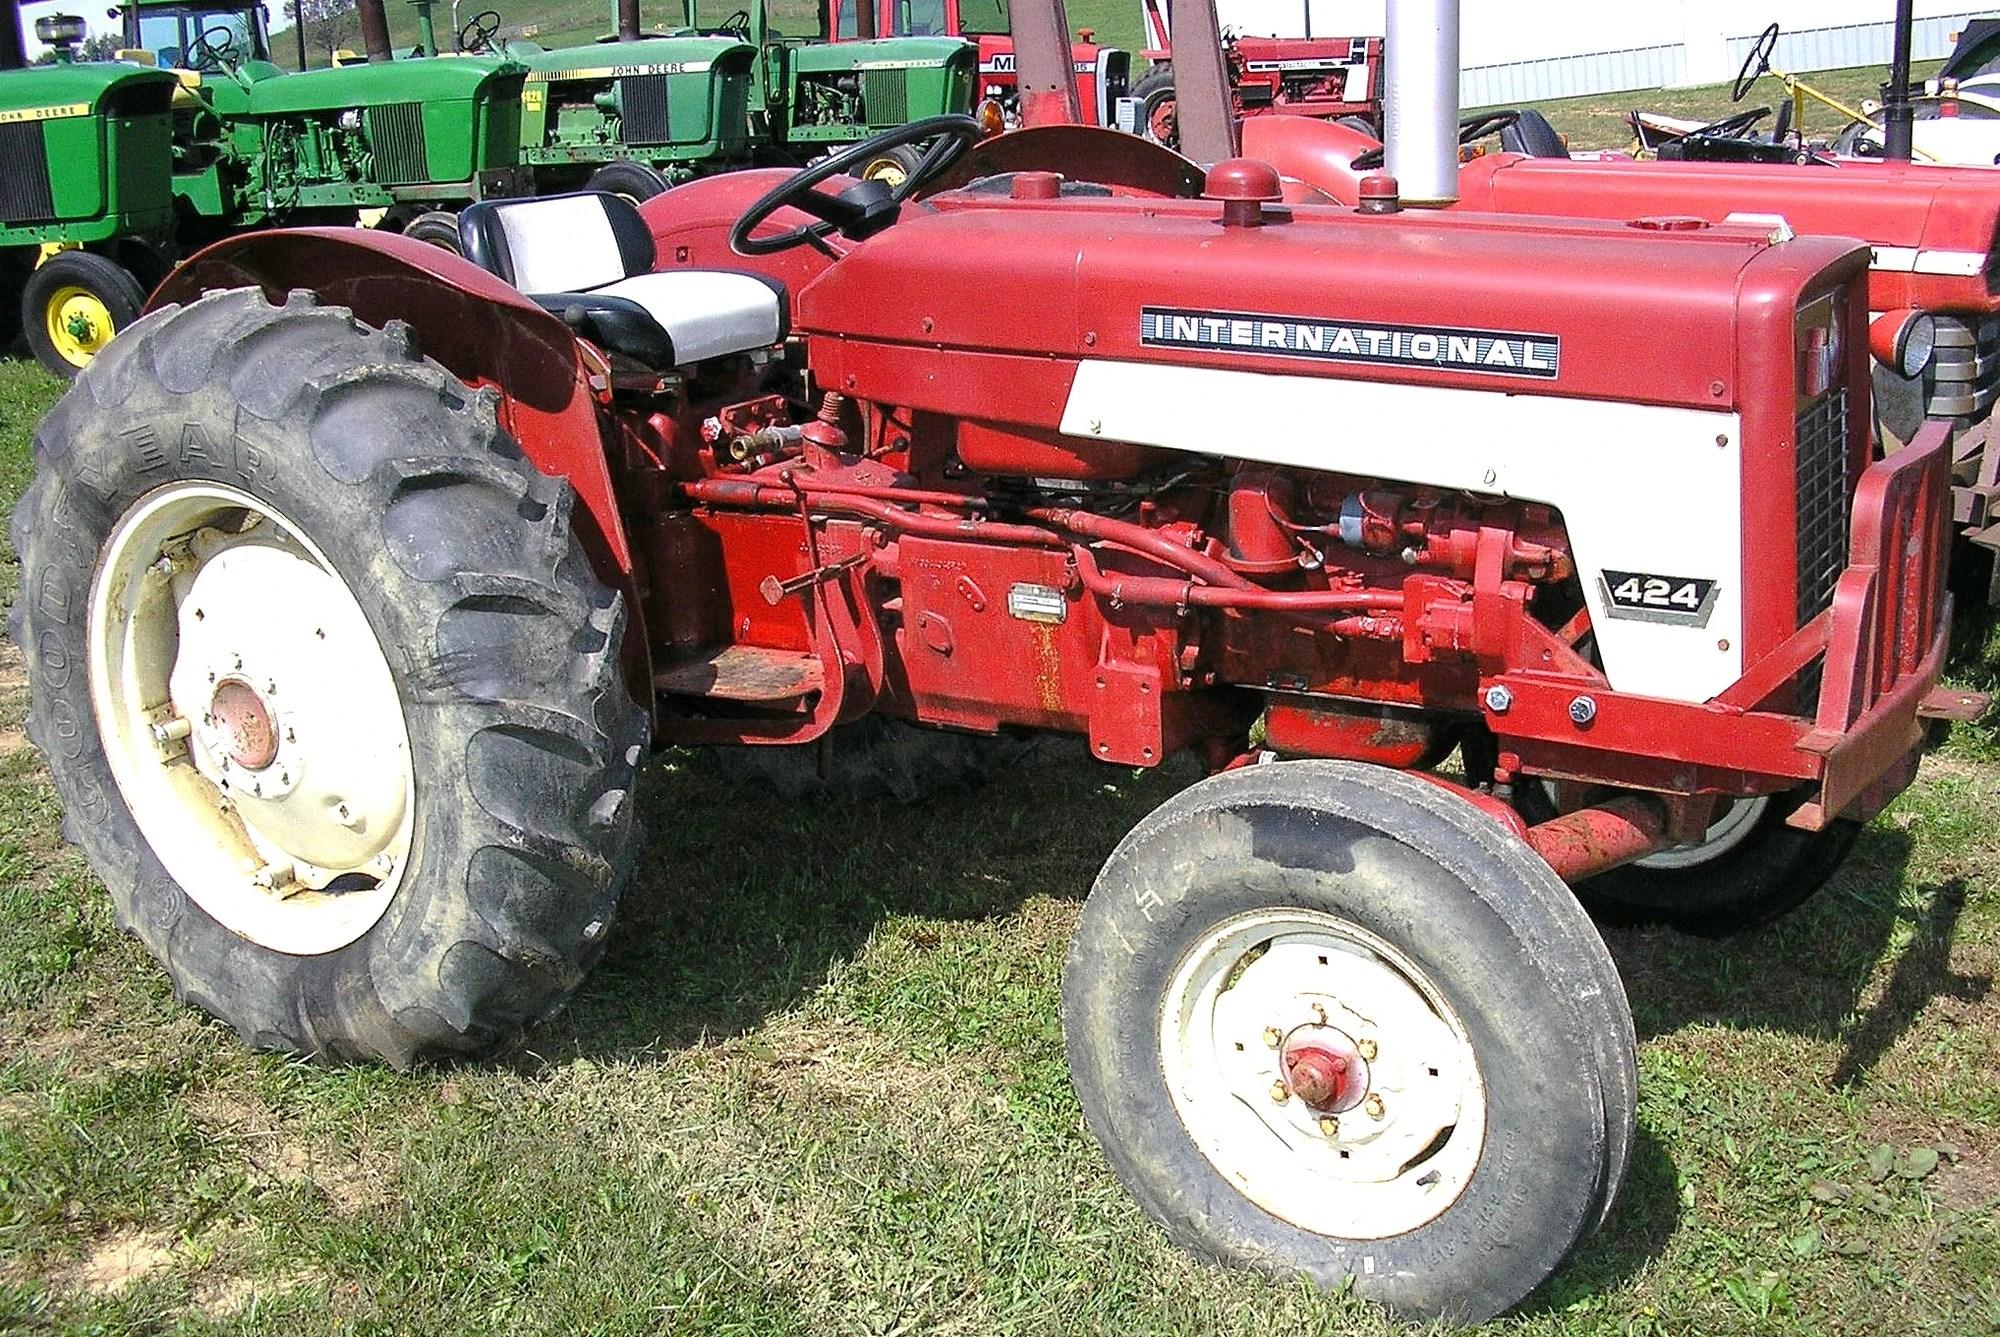 international harvester 424 tractor construction plant wiki international harvester 454 tractor on 806 farmall pto parts diagram [ 2000 x 1337 Pixel ]